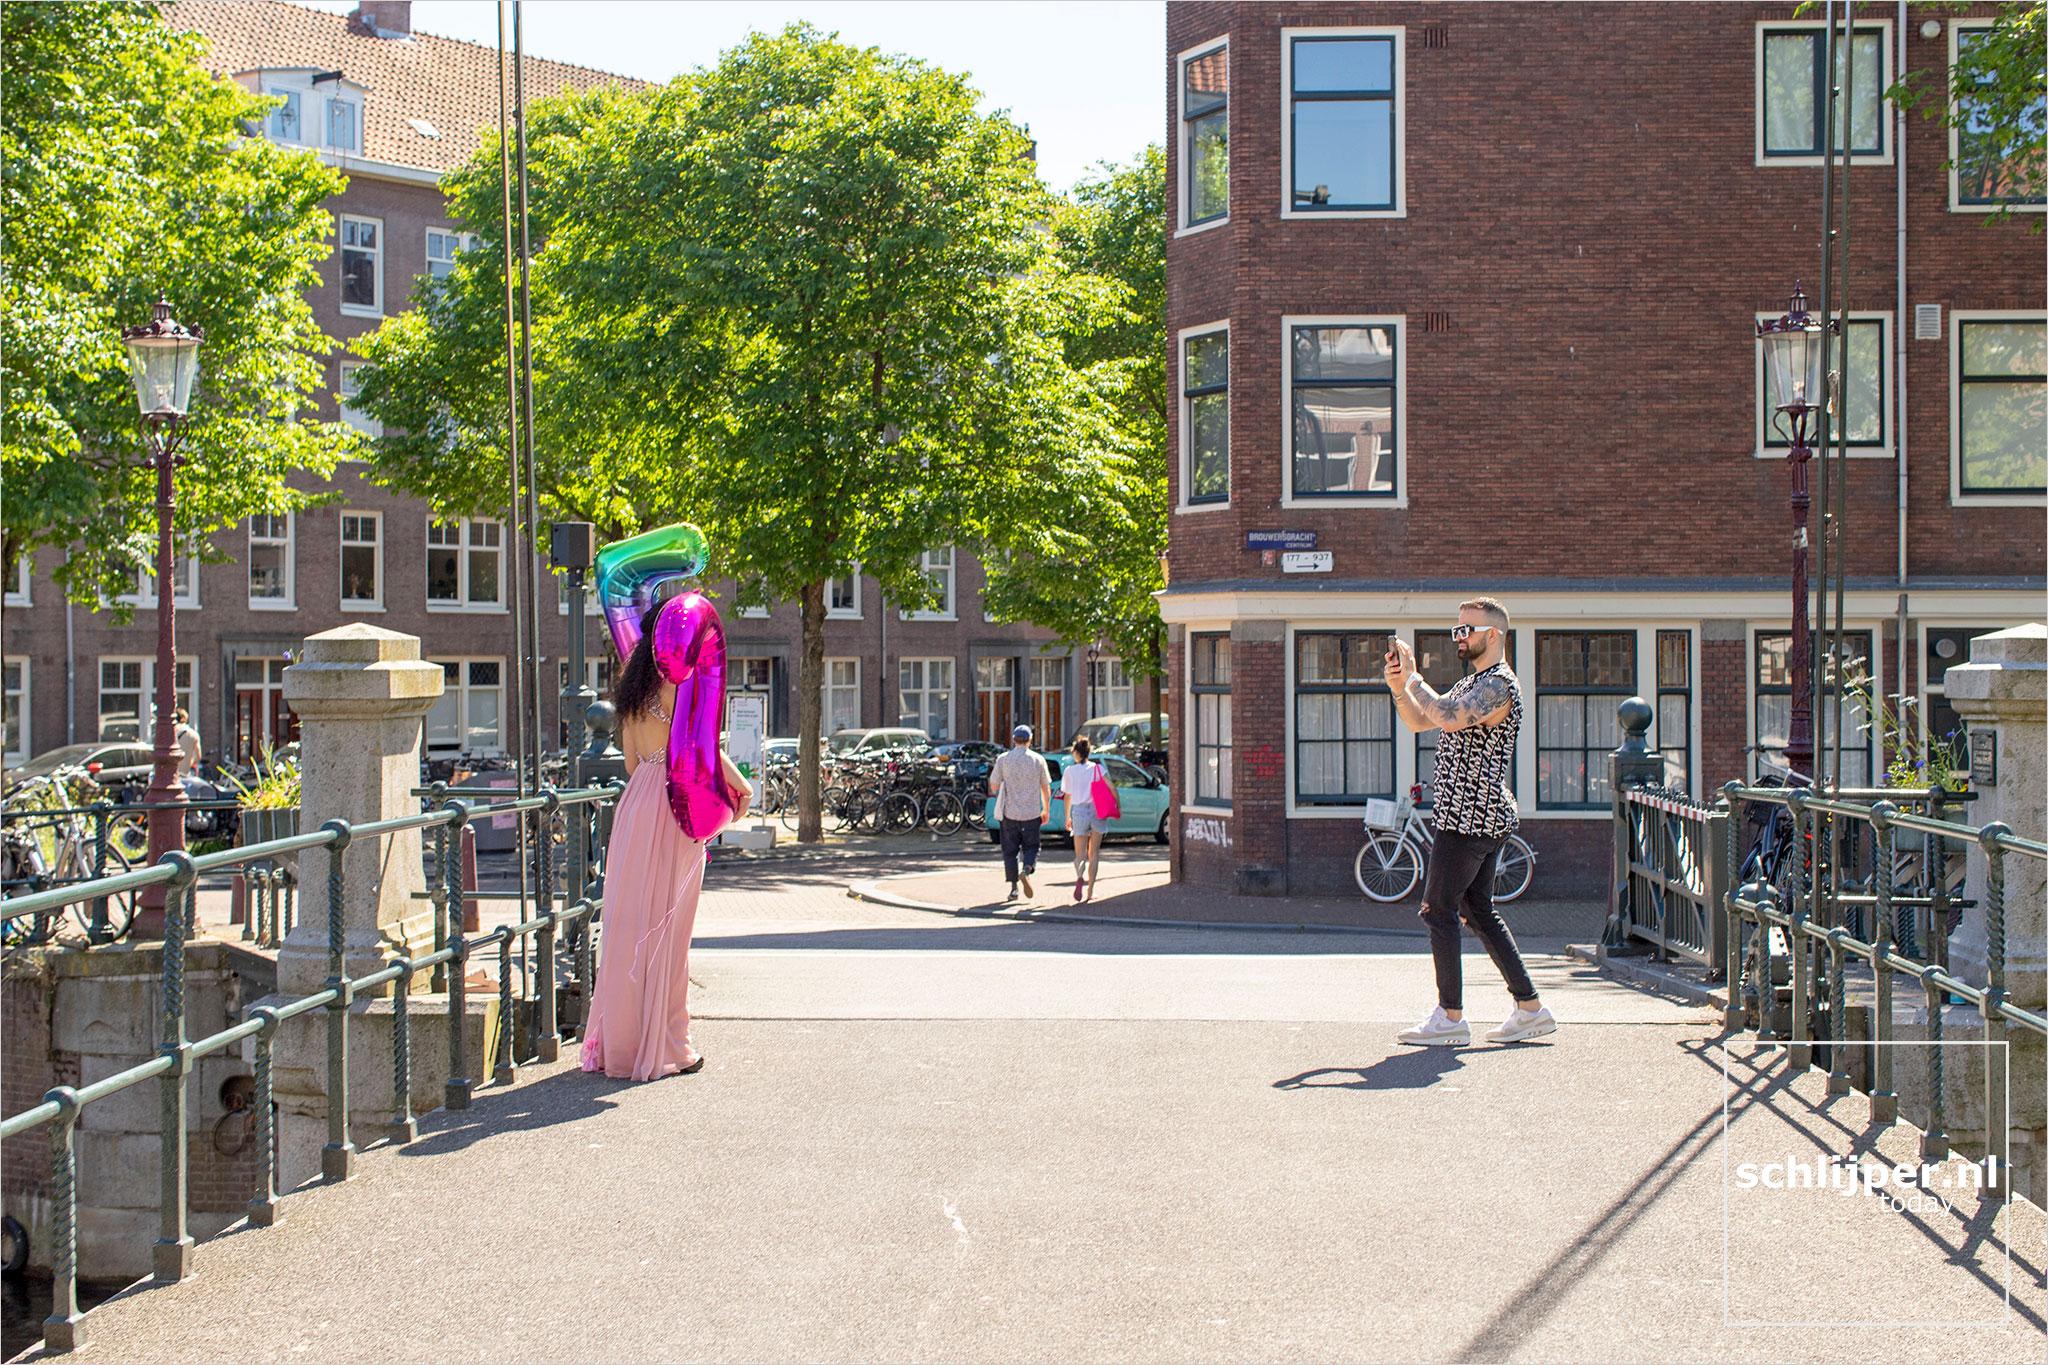 The Netherlands, Amsterdam, 6 juni 2021